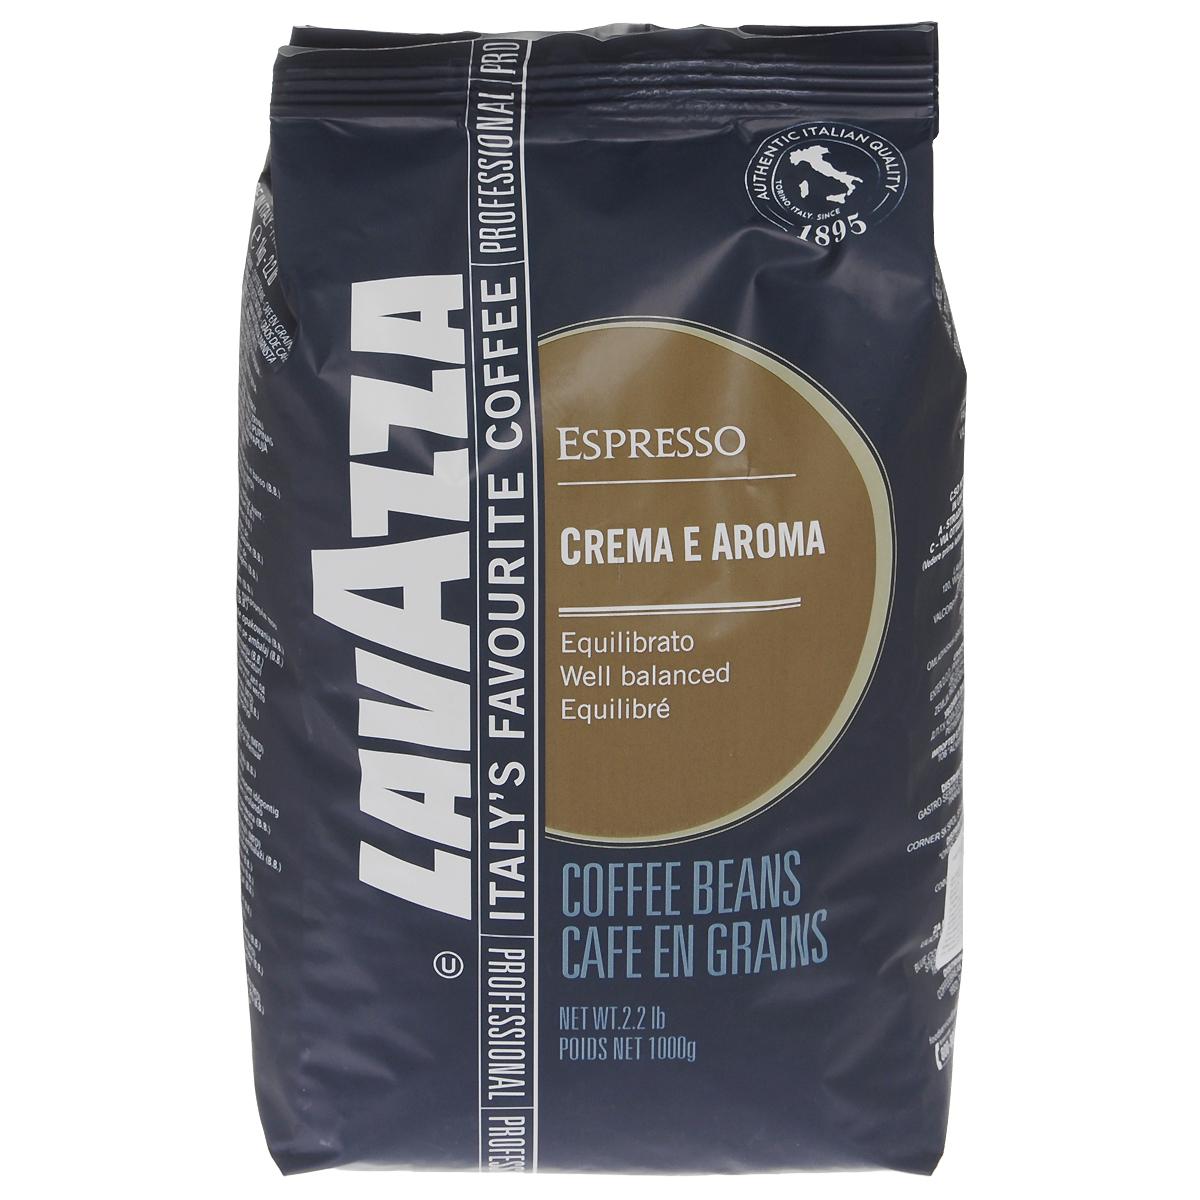 Lavazza Crema e Aroma Espresso кофе в зернах, 1 кг цены